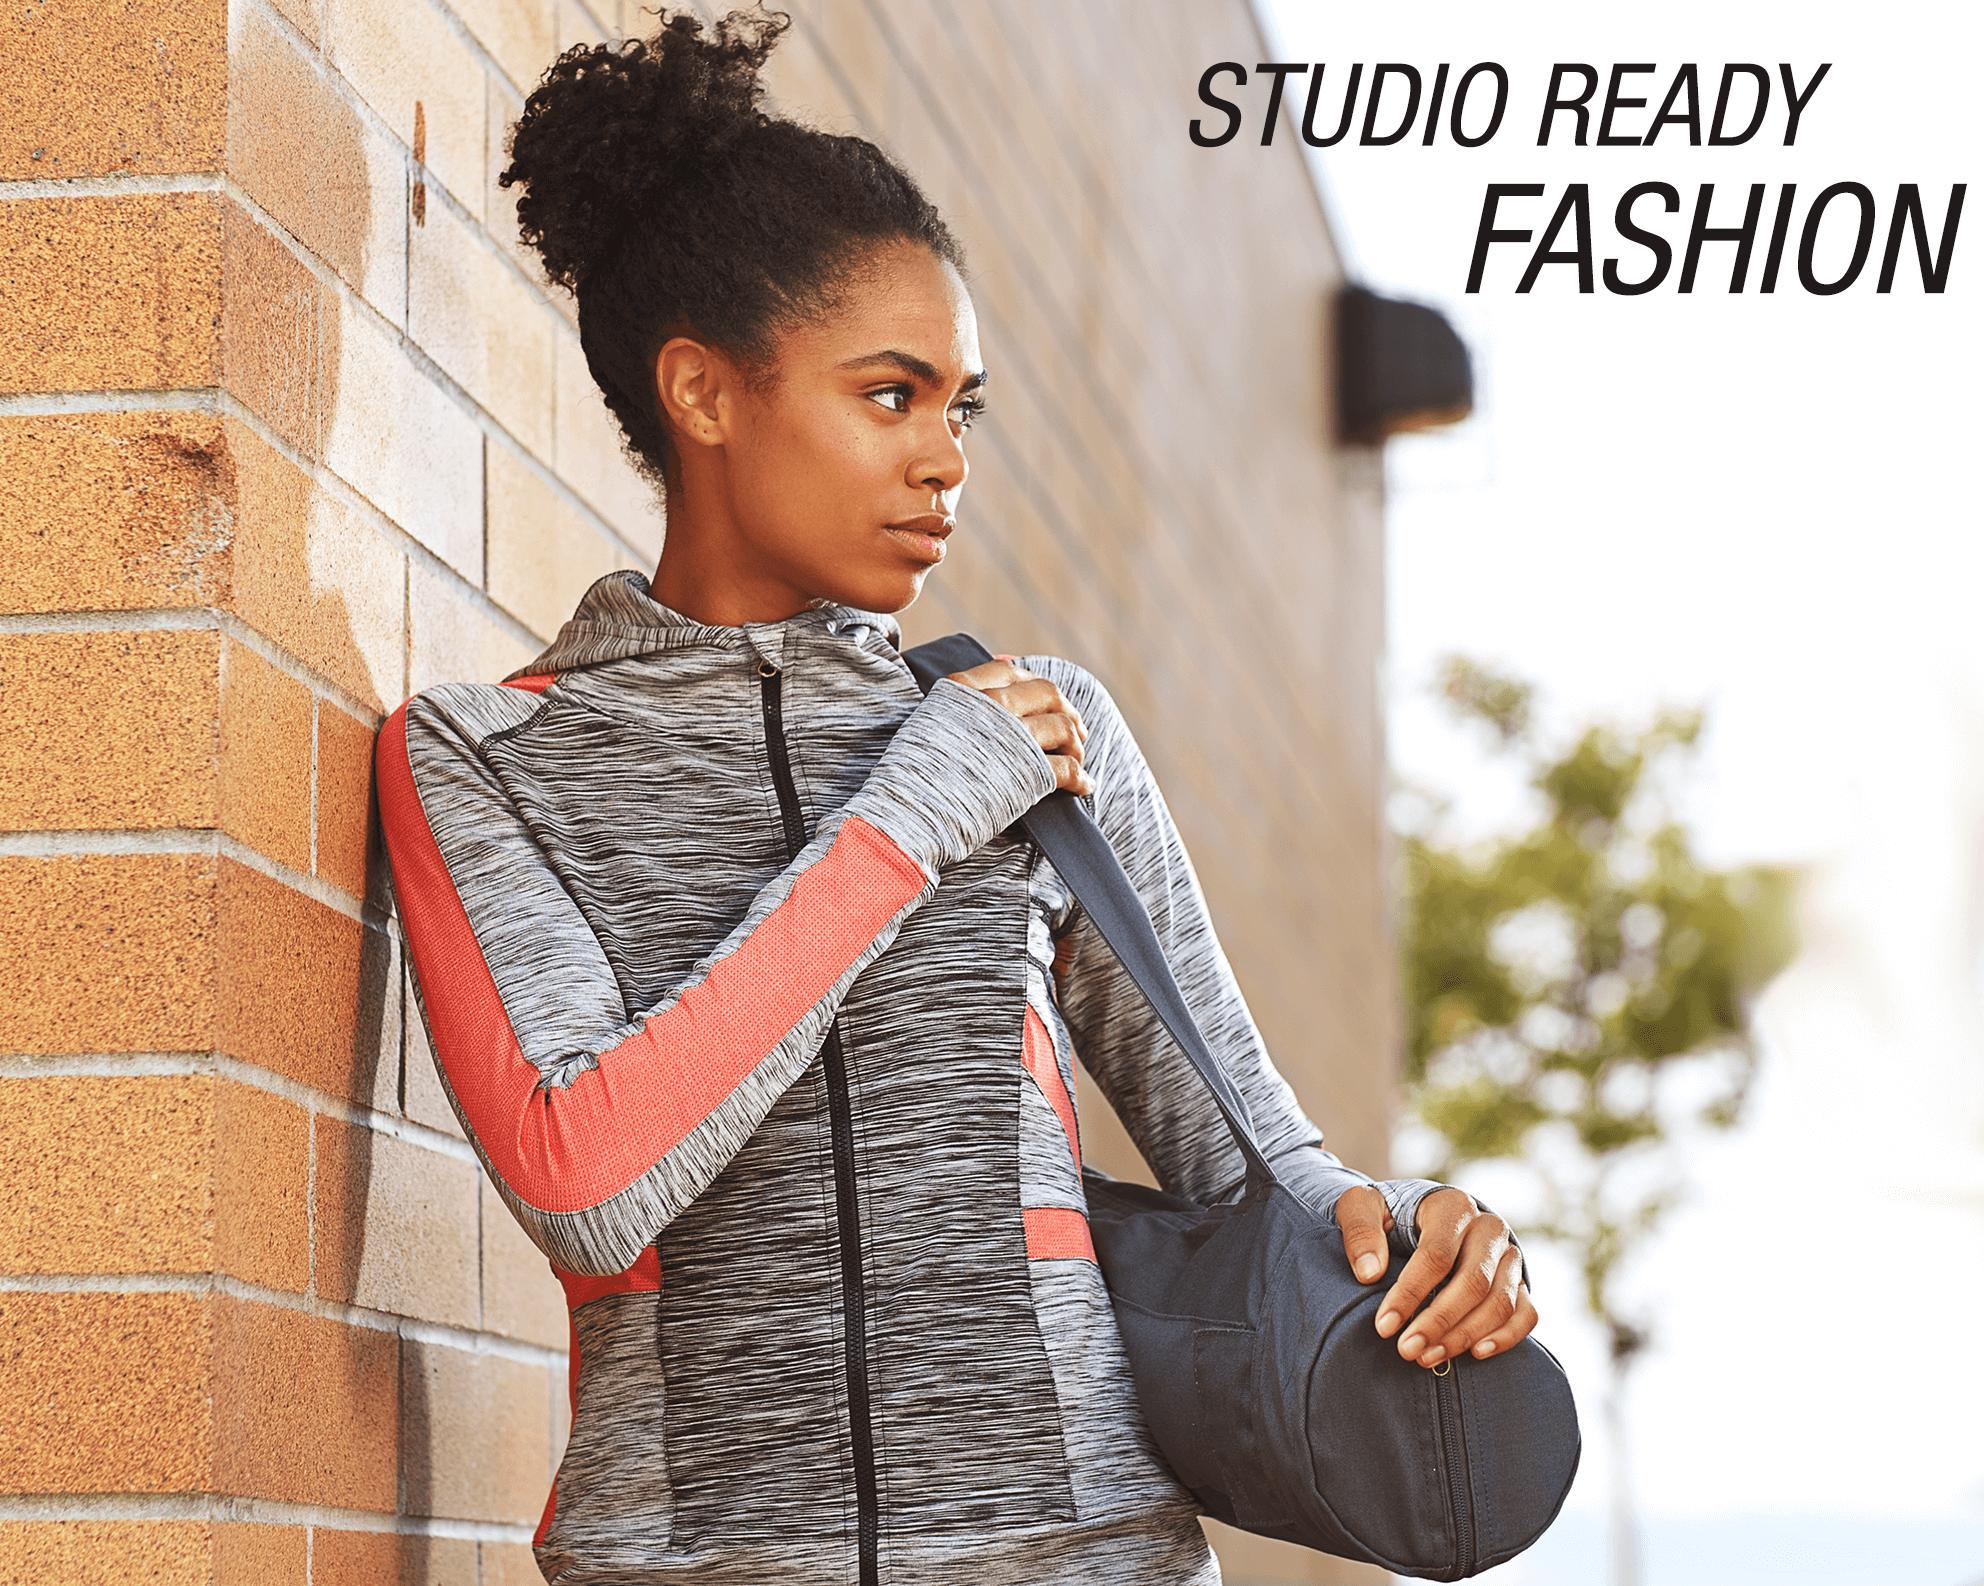 Yoga Mats Blocks Straps Bags Clothing Amazon Com